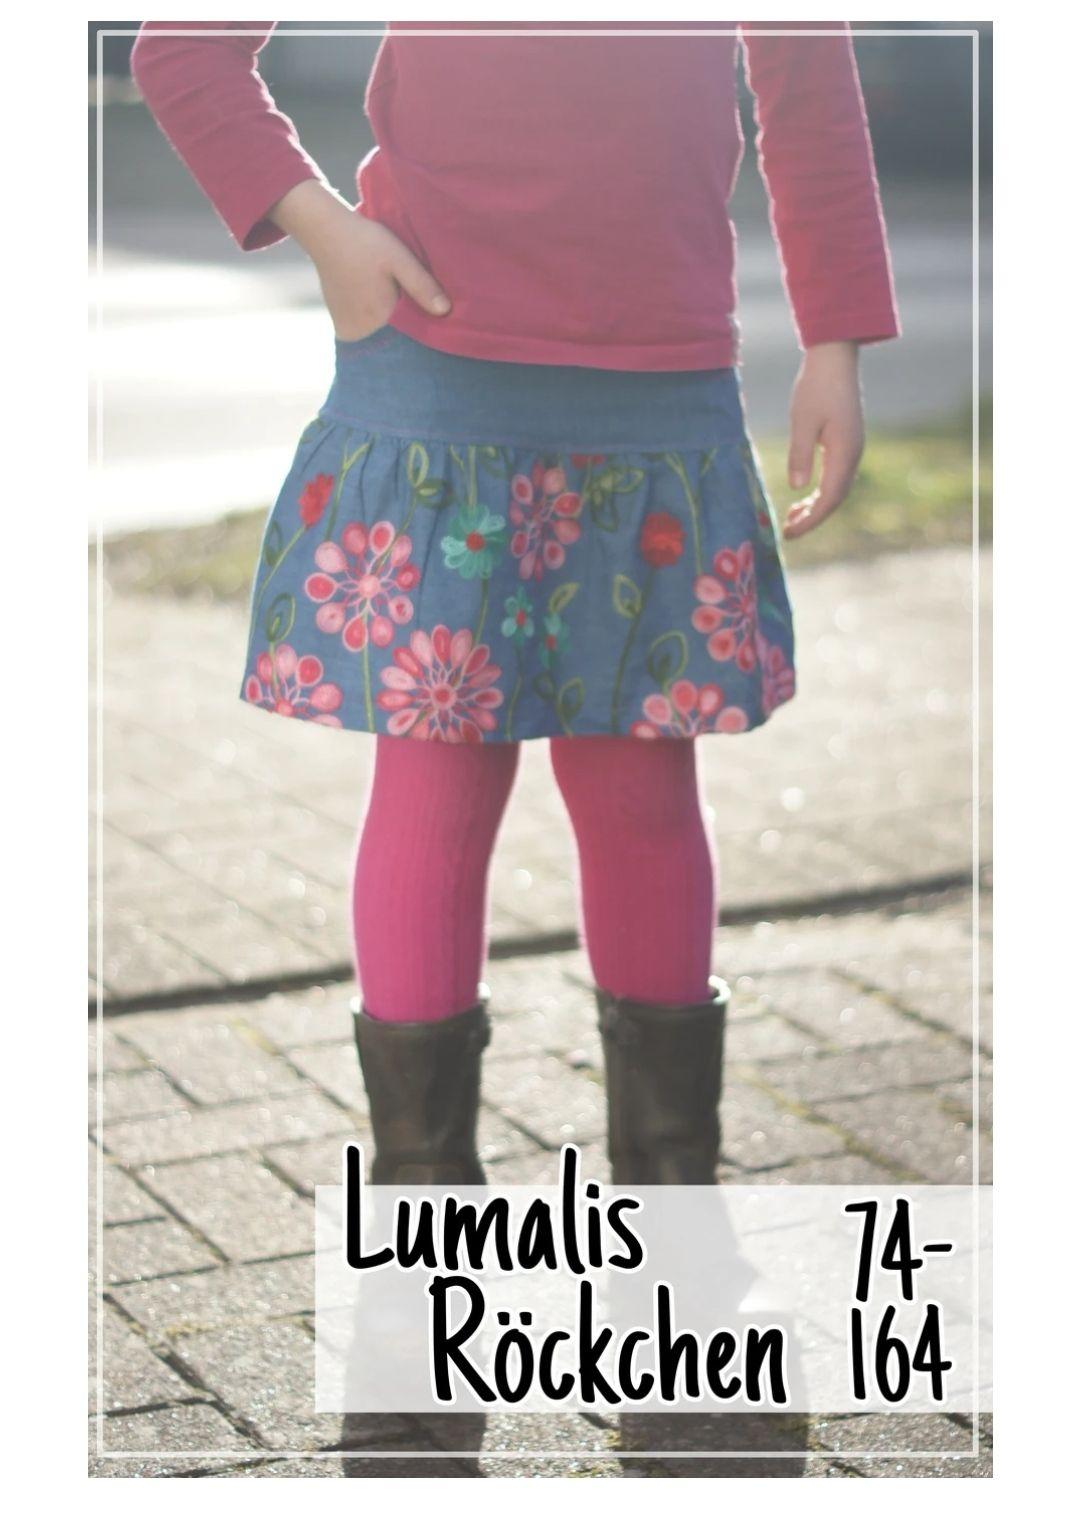 [GRATIS Schnittmuster] Lumali kostenloses Schnittmuster E-Book für einen Kinderrock Gr 74-164